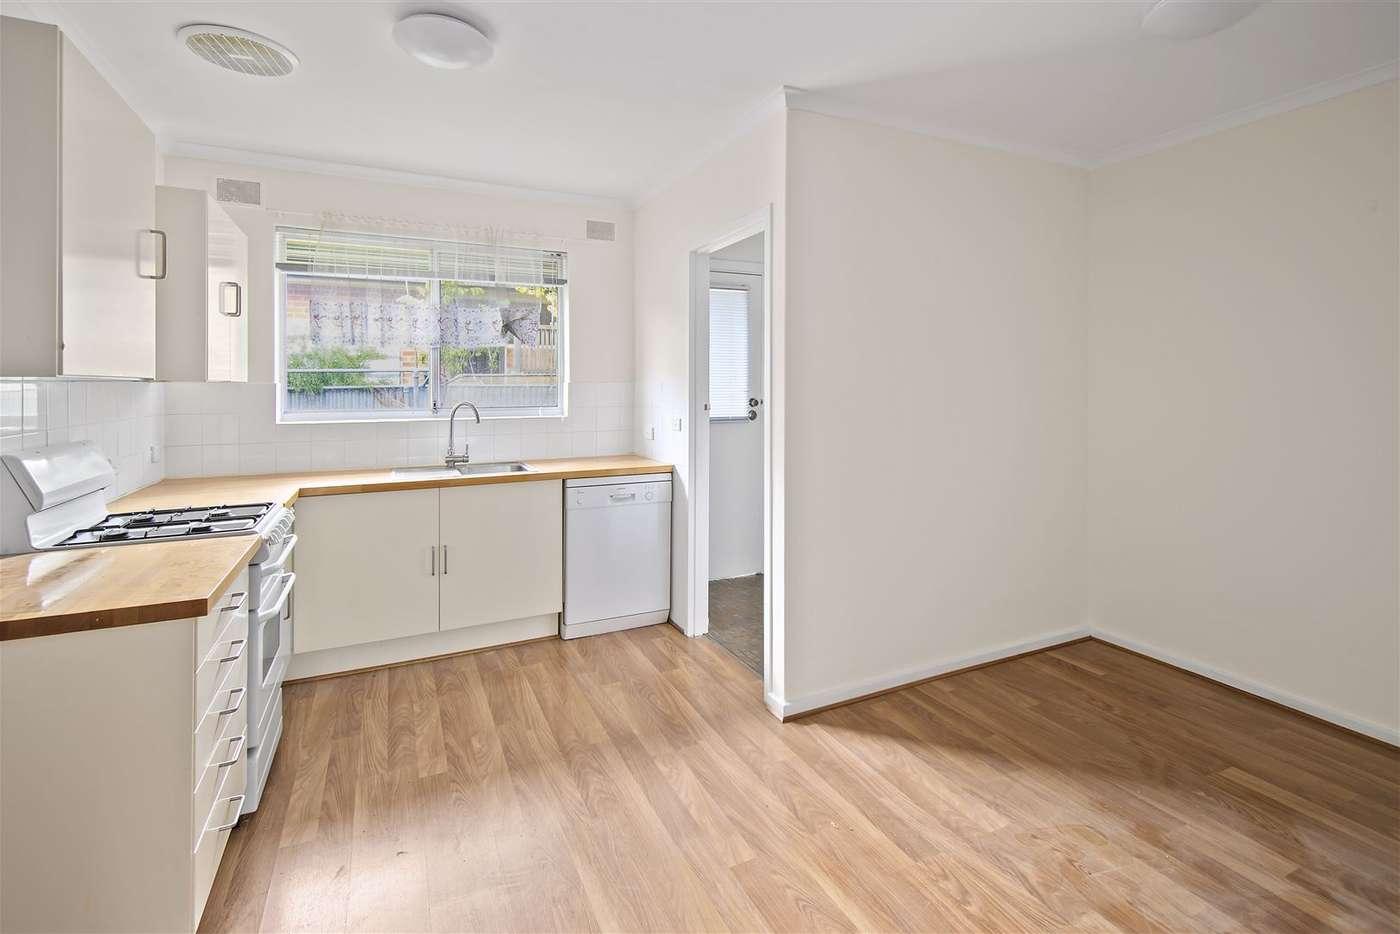 Sixth view of Homely unit listing, 3/29 Seaview Road, Fullarton SA 5063